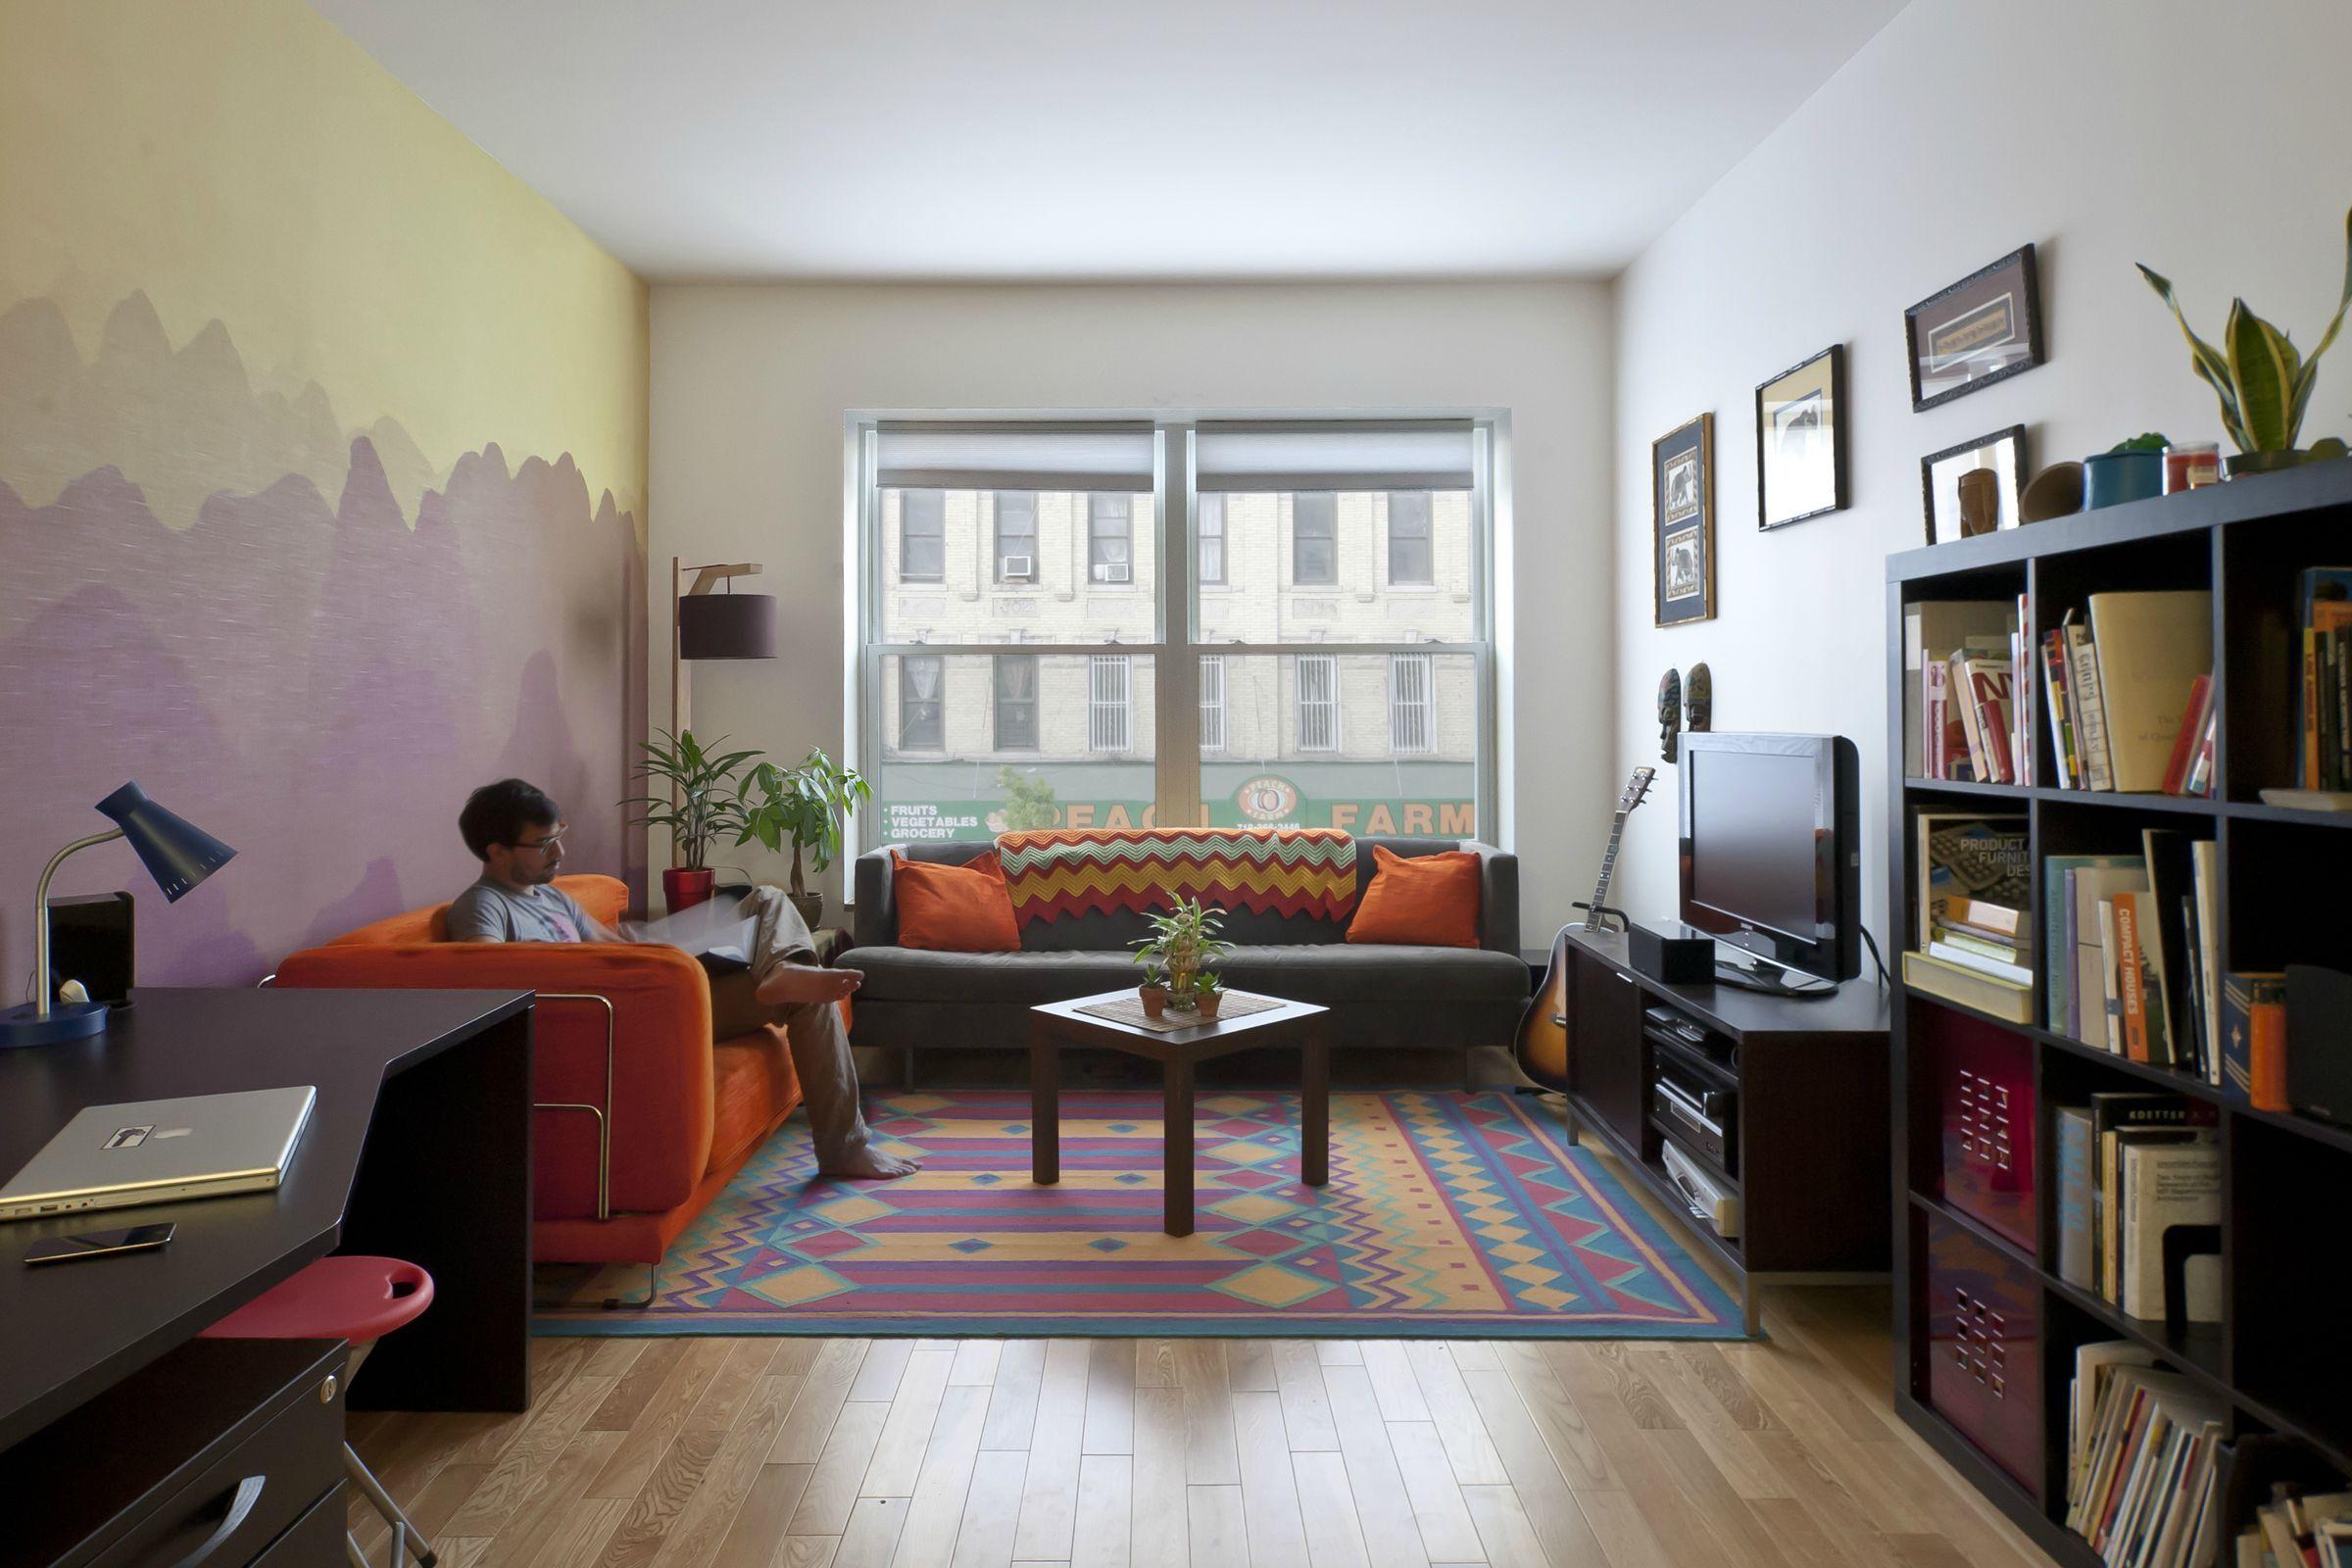 Living Room Ideas Reddit Home Decor Living Room Setup Decor